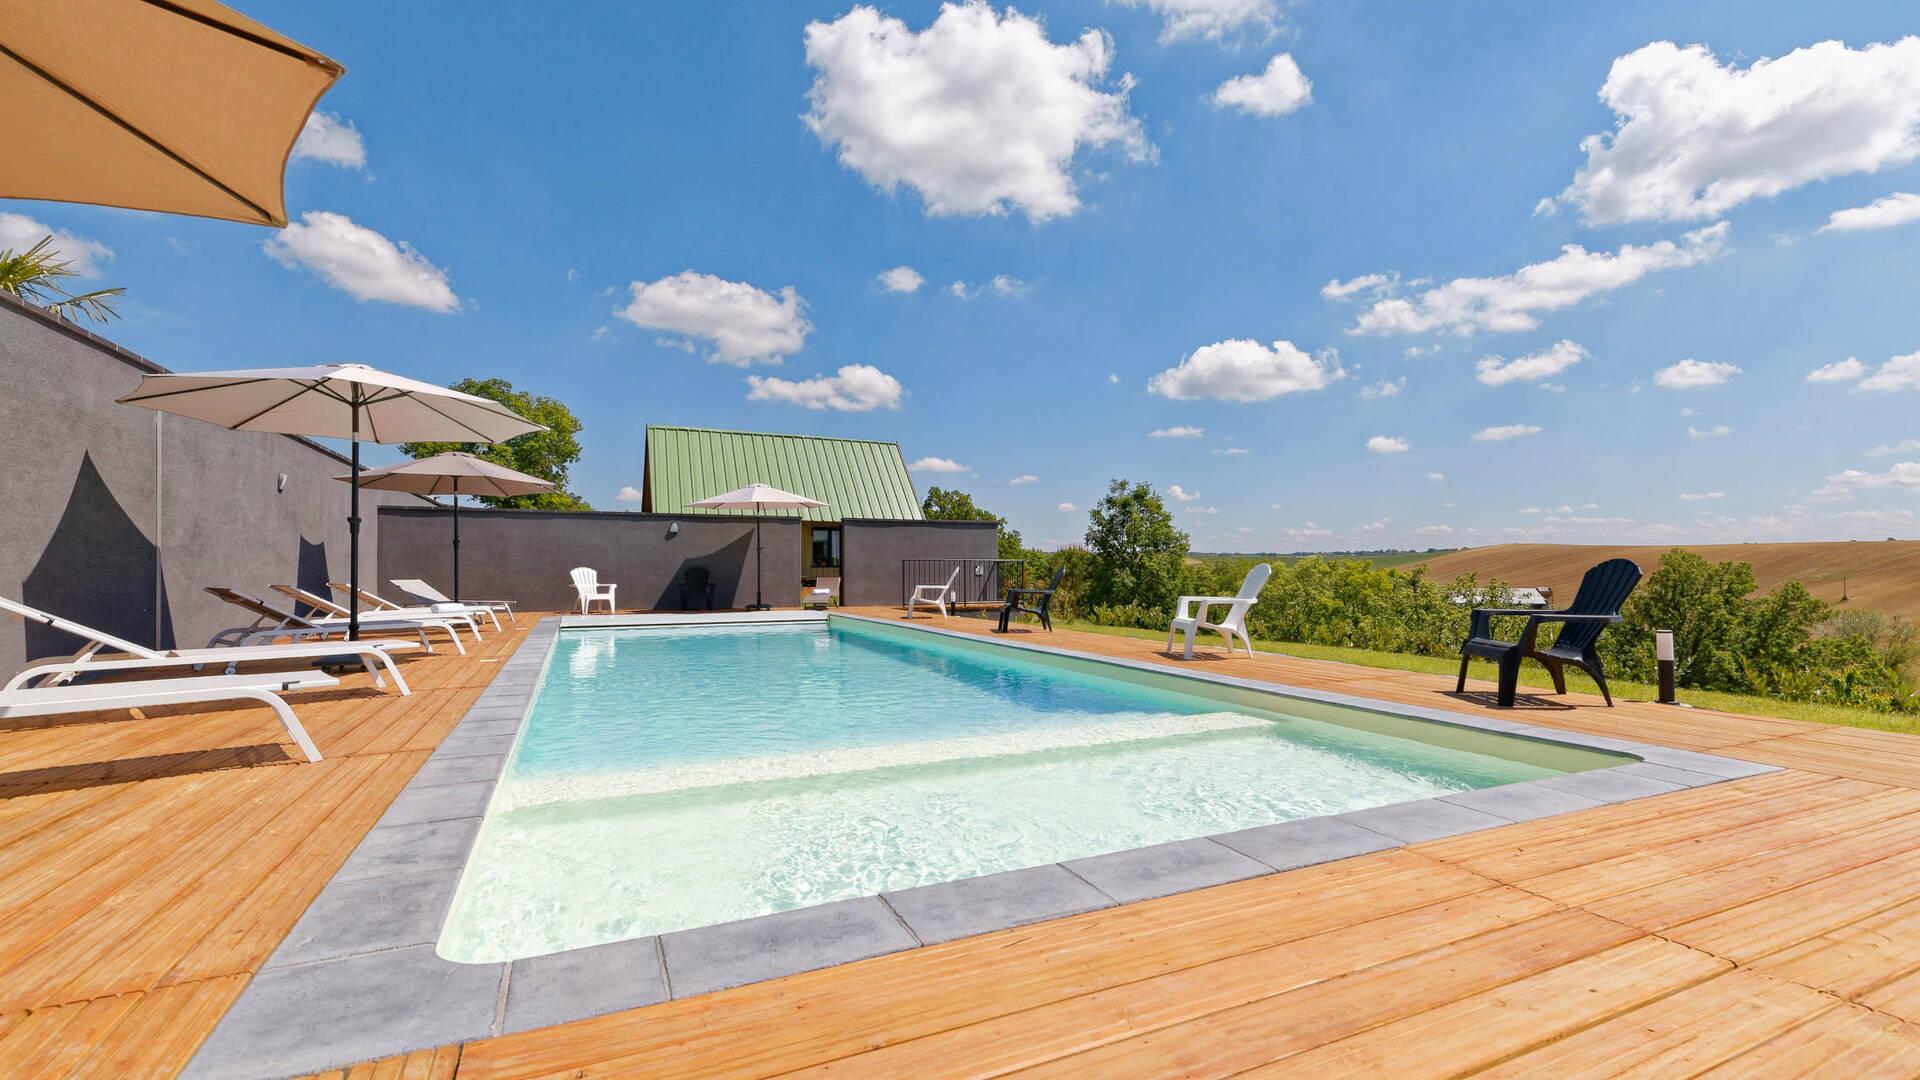 Swimming Pool, Gite La Maison Bleue, Savignac-Mona, Lombez, Samatan, Savès, Gascogne, Gers, France